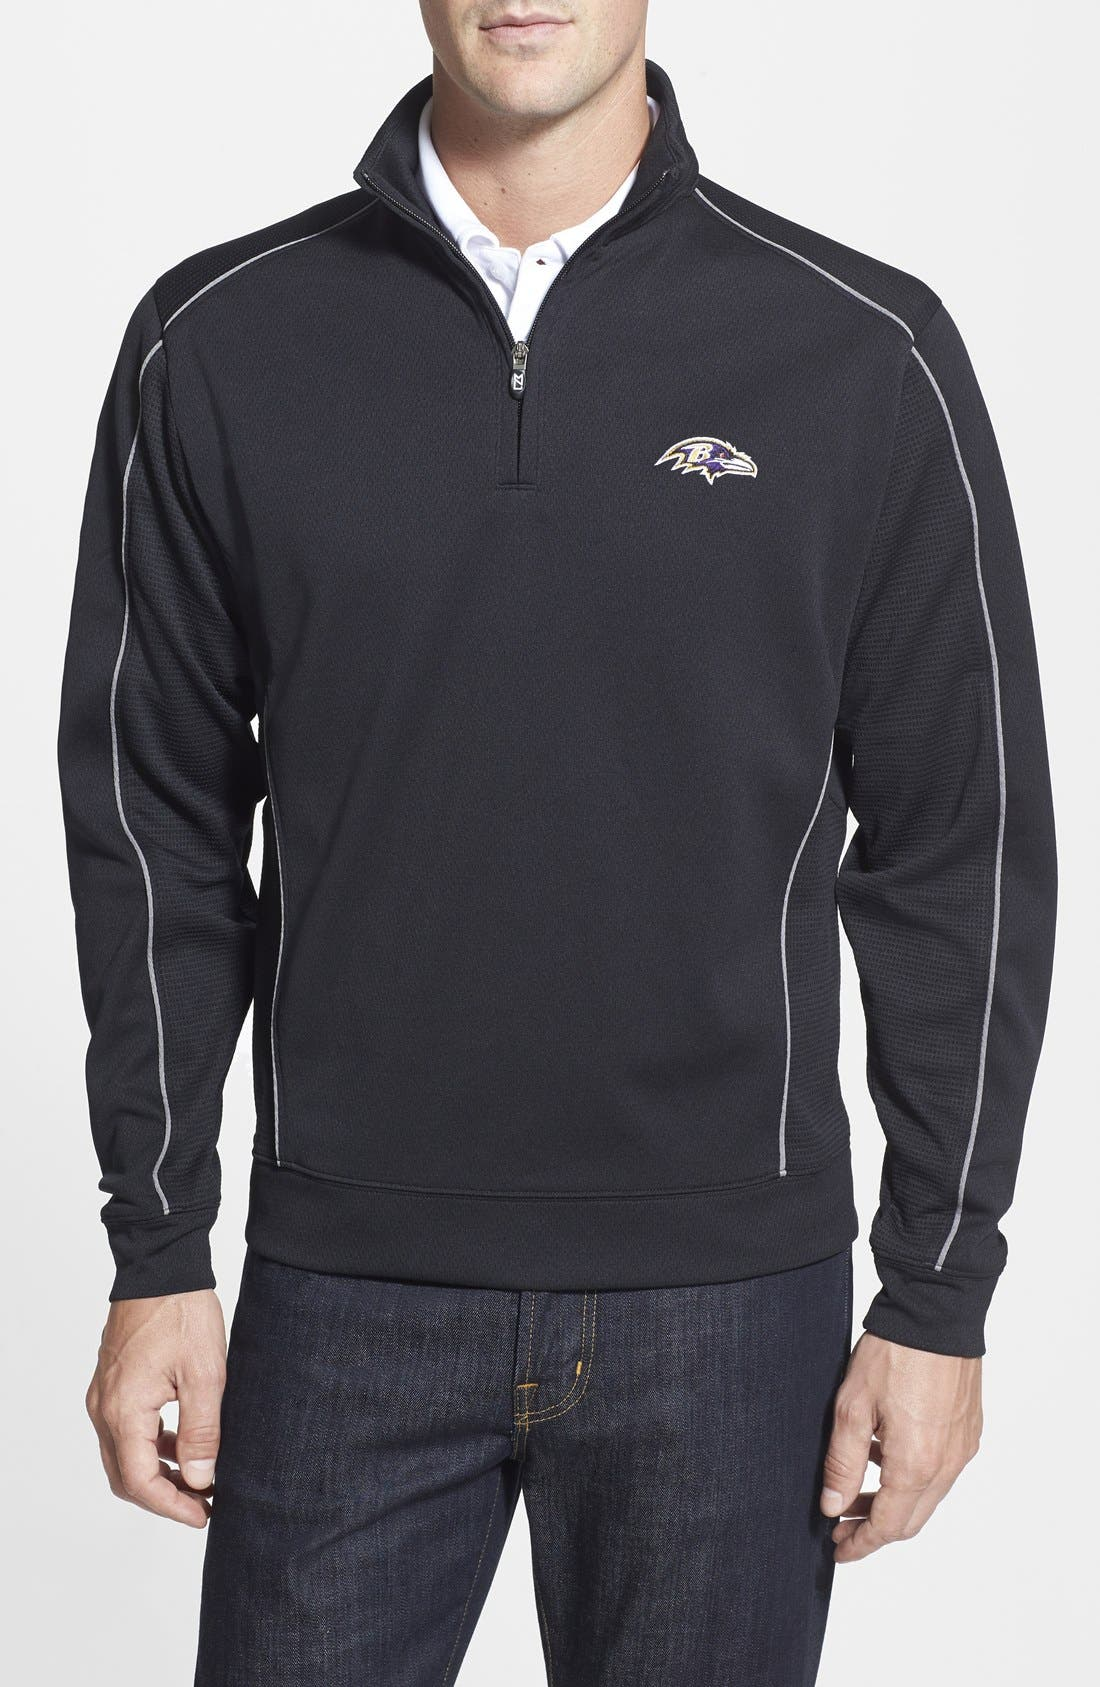 Baltimore Ravens - Edge DryTec Moisture Wicking Half Zip Pullover,                         Main,                         color, Black